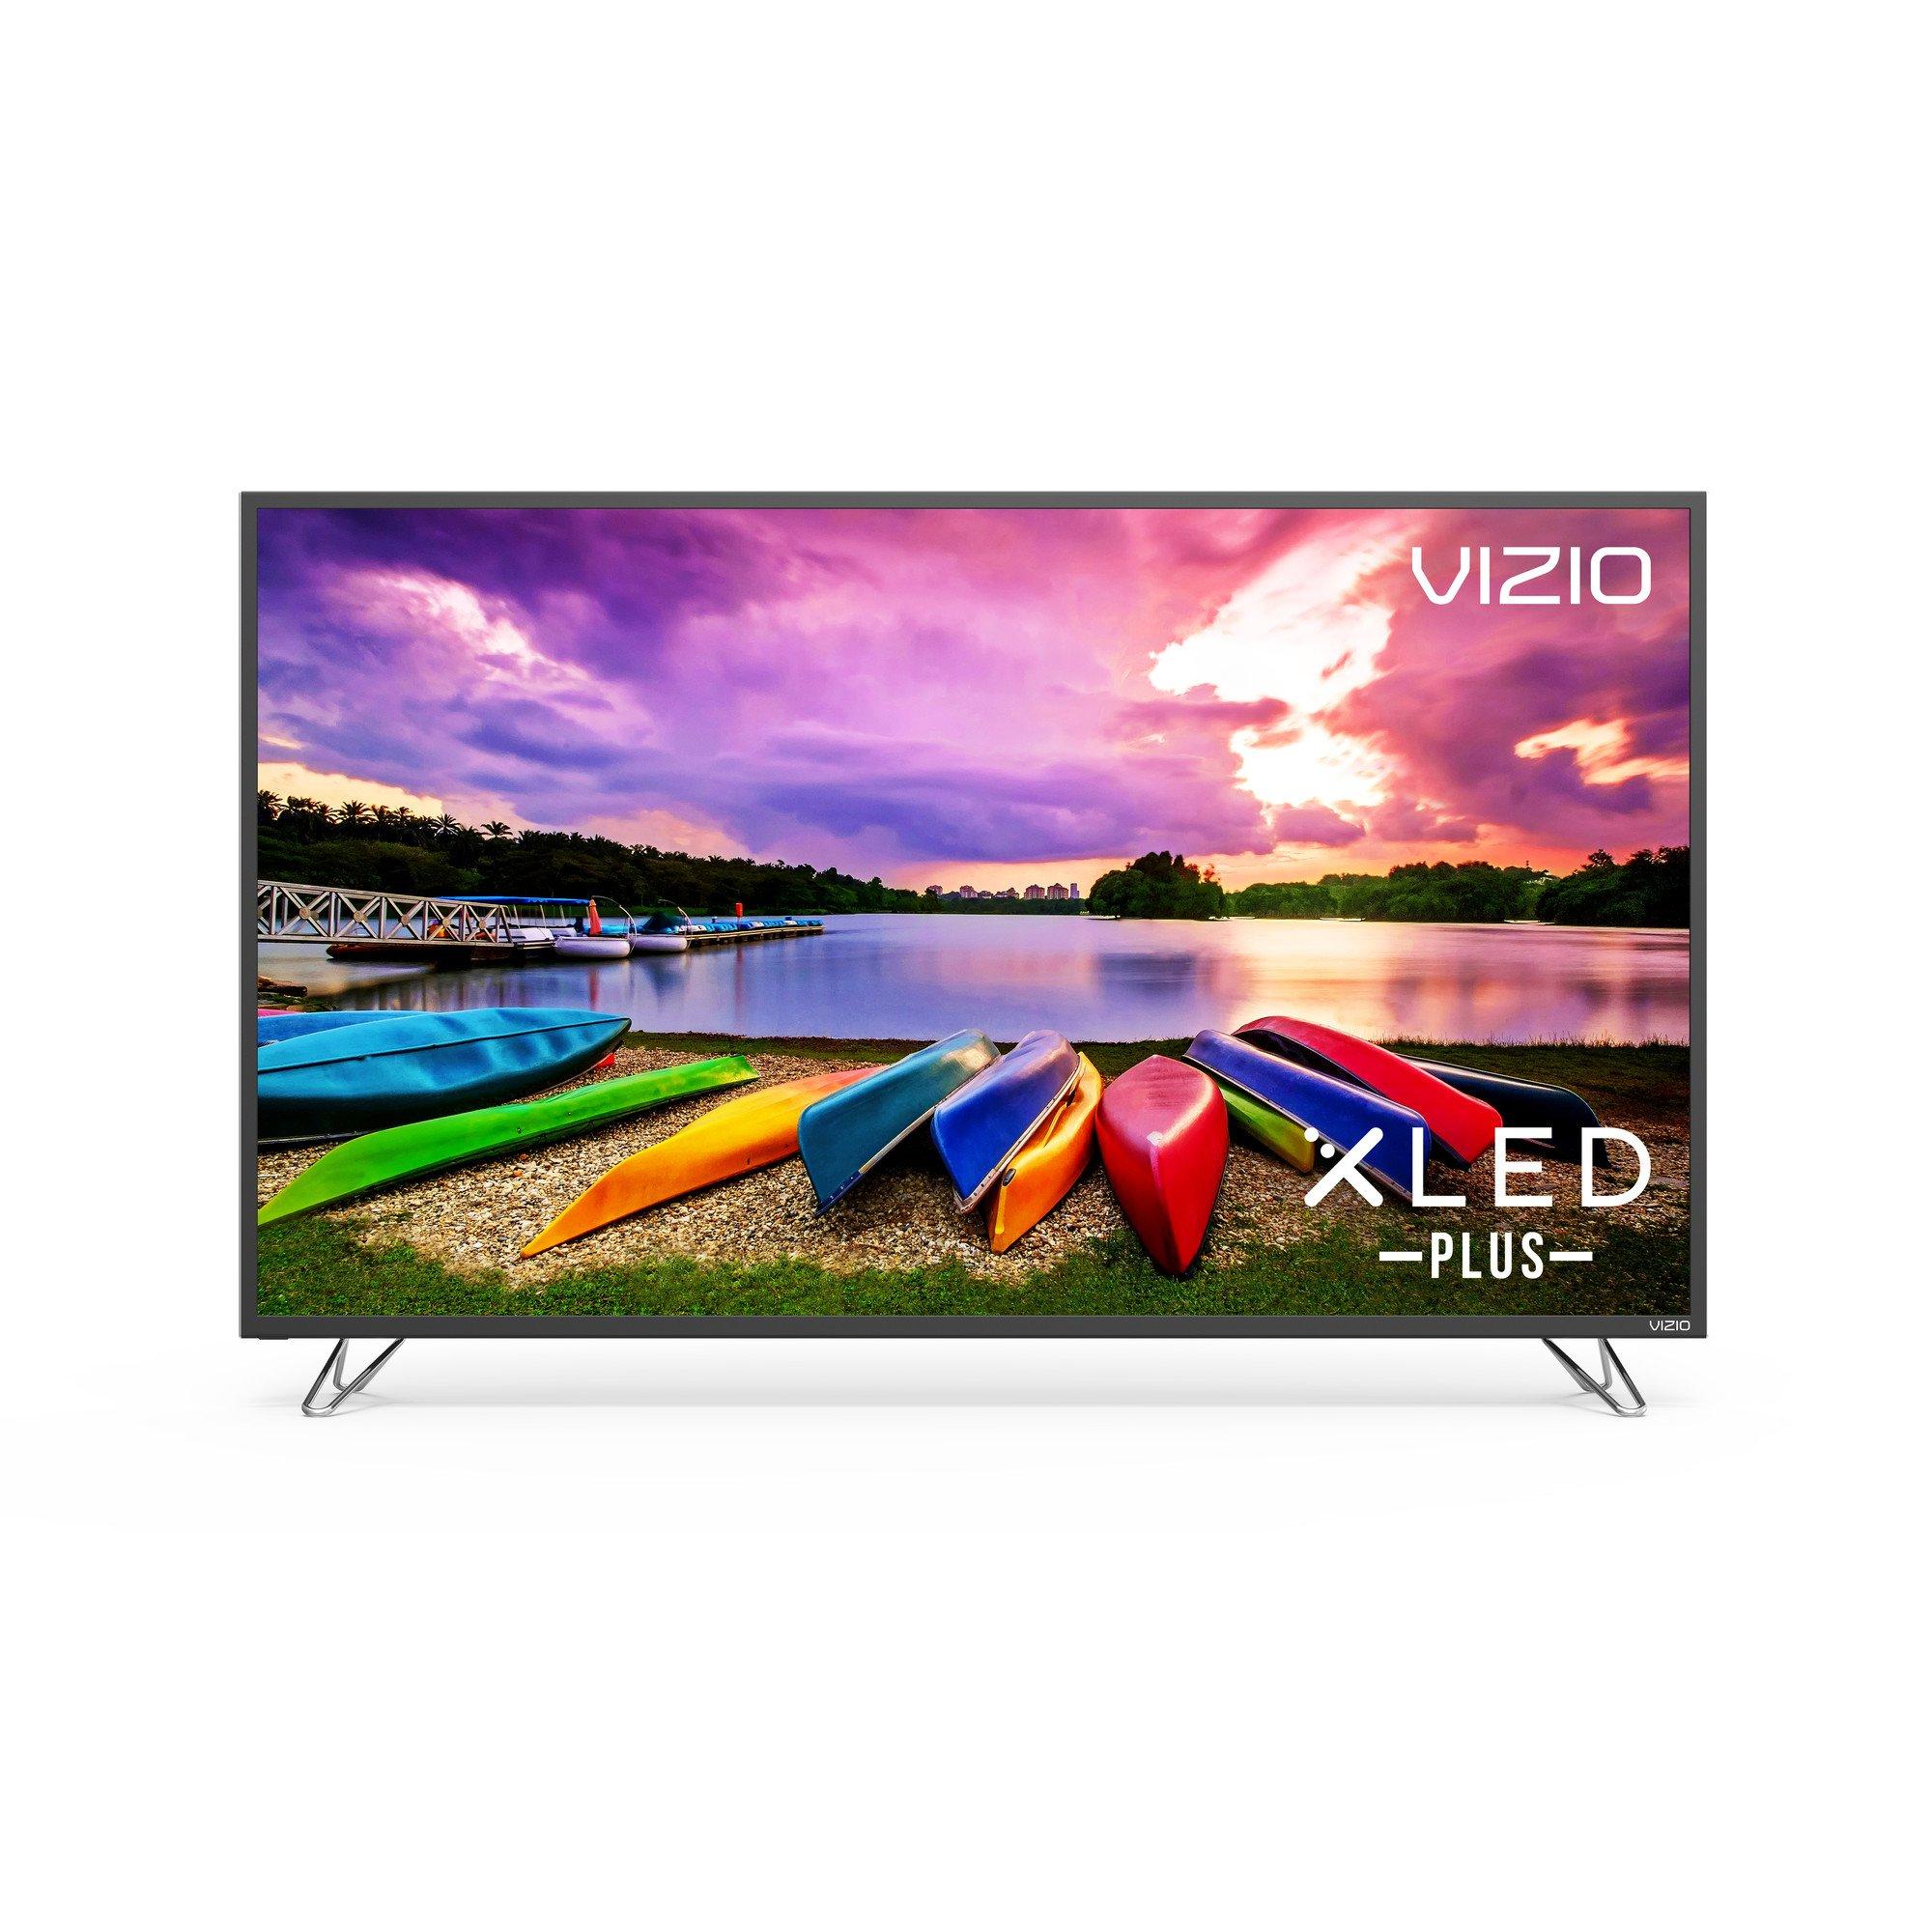 VIZIO M55-E0 SmartCast M-Series 55'' Class Ultra HD HDR XLED Plus Display 120Hz